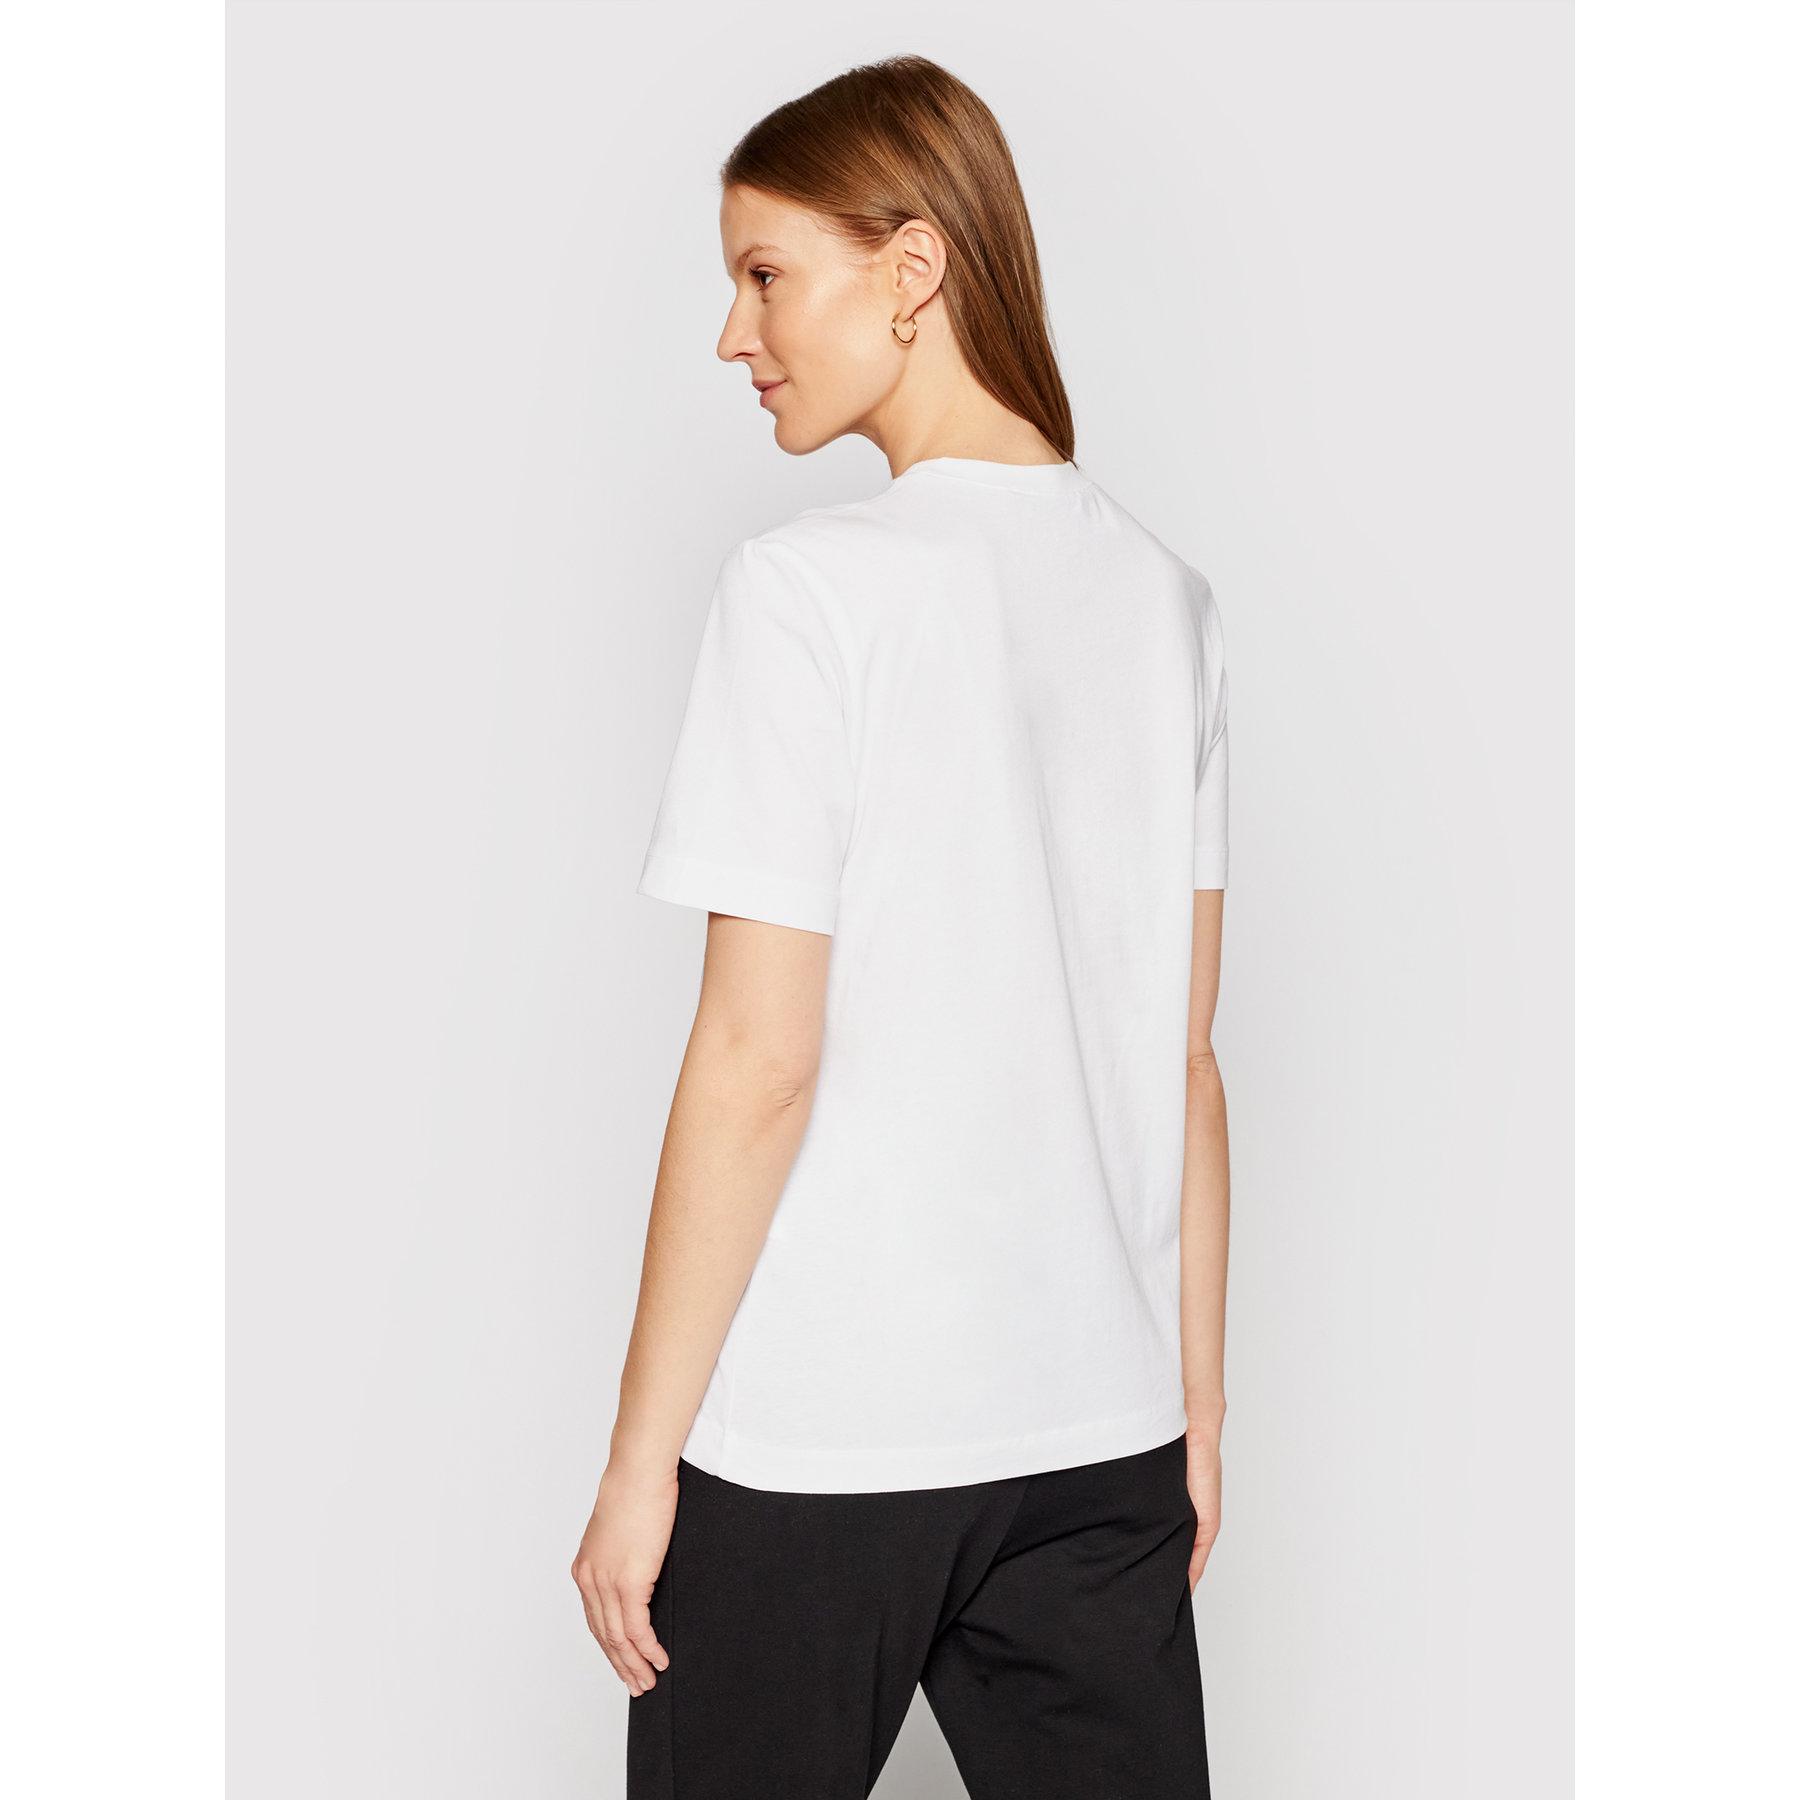 LOVE MOSCHINO   T-Shirts   W4H06 10 M3876A00